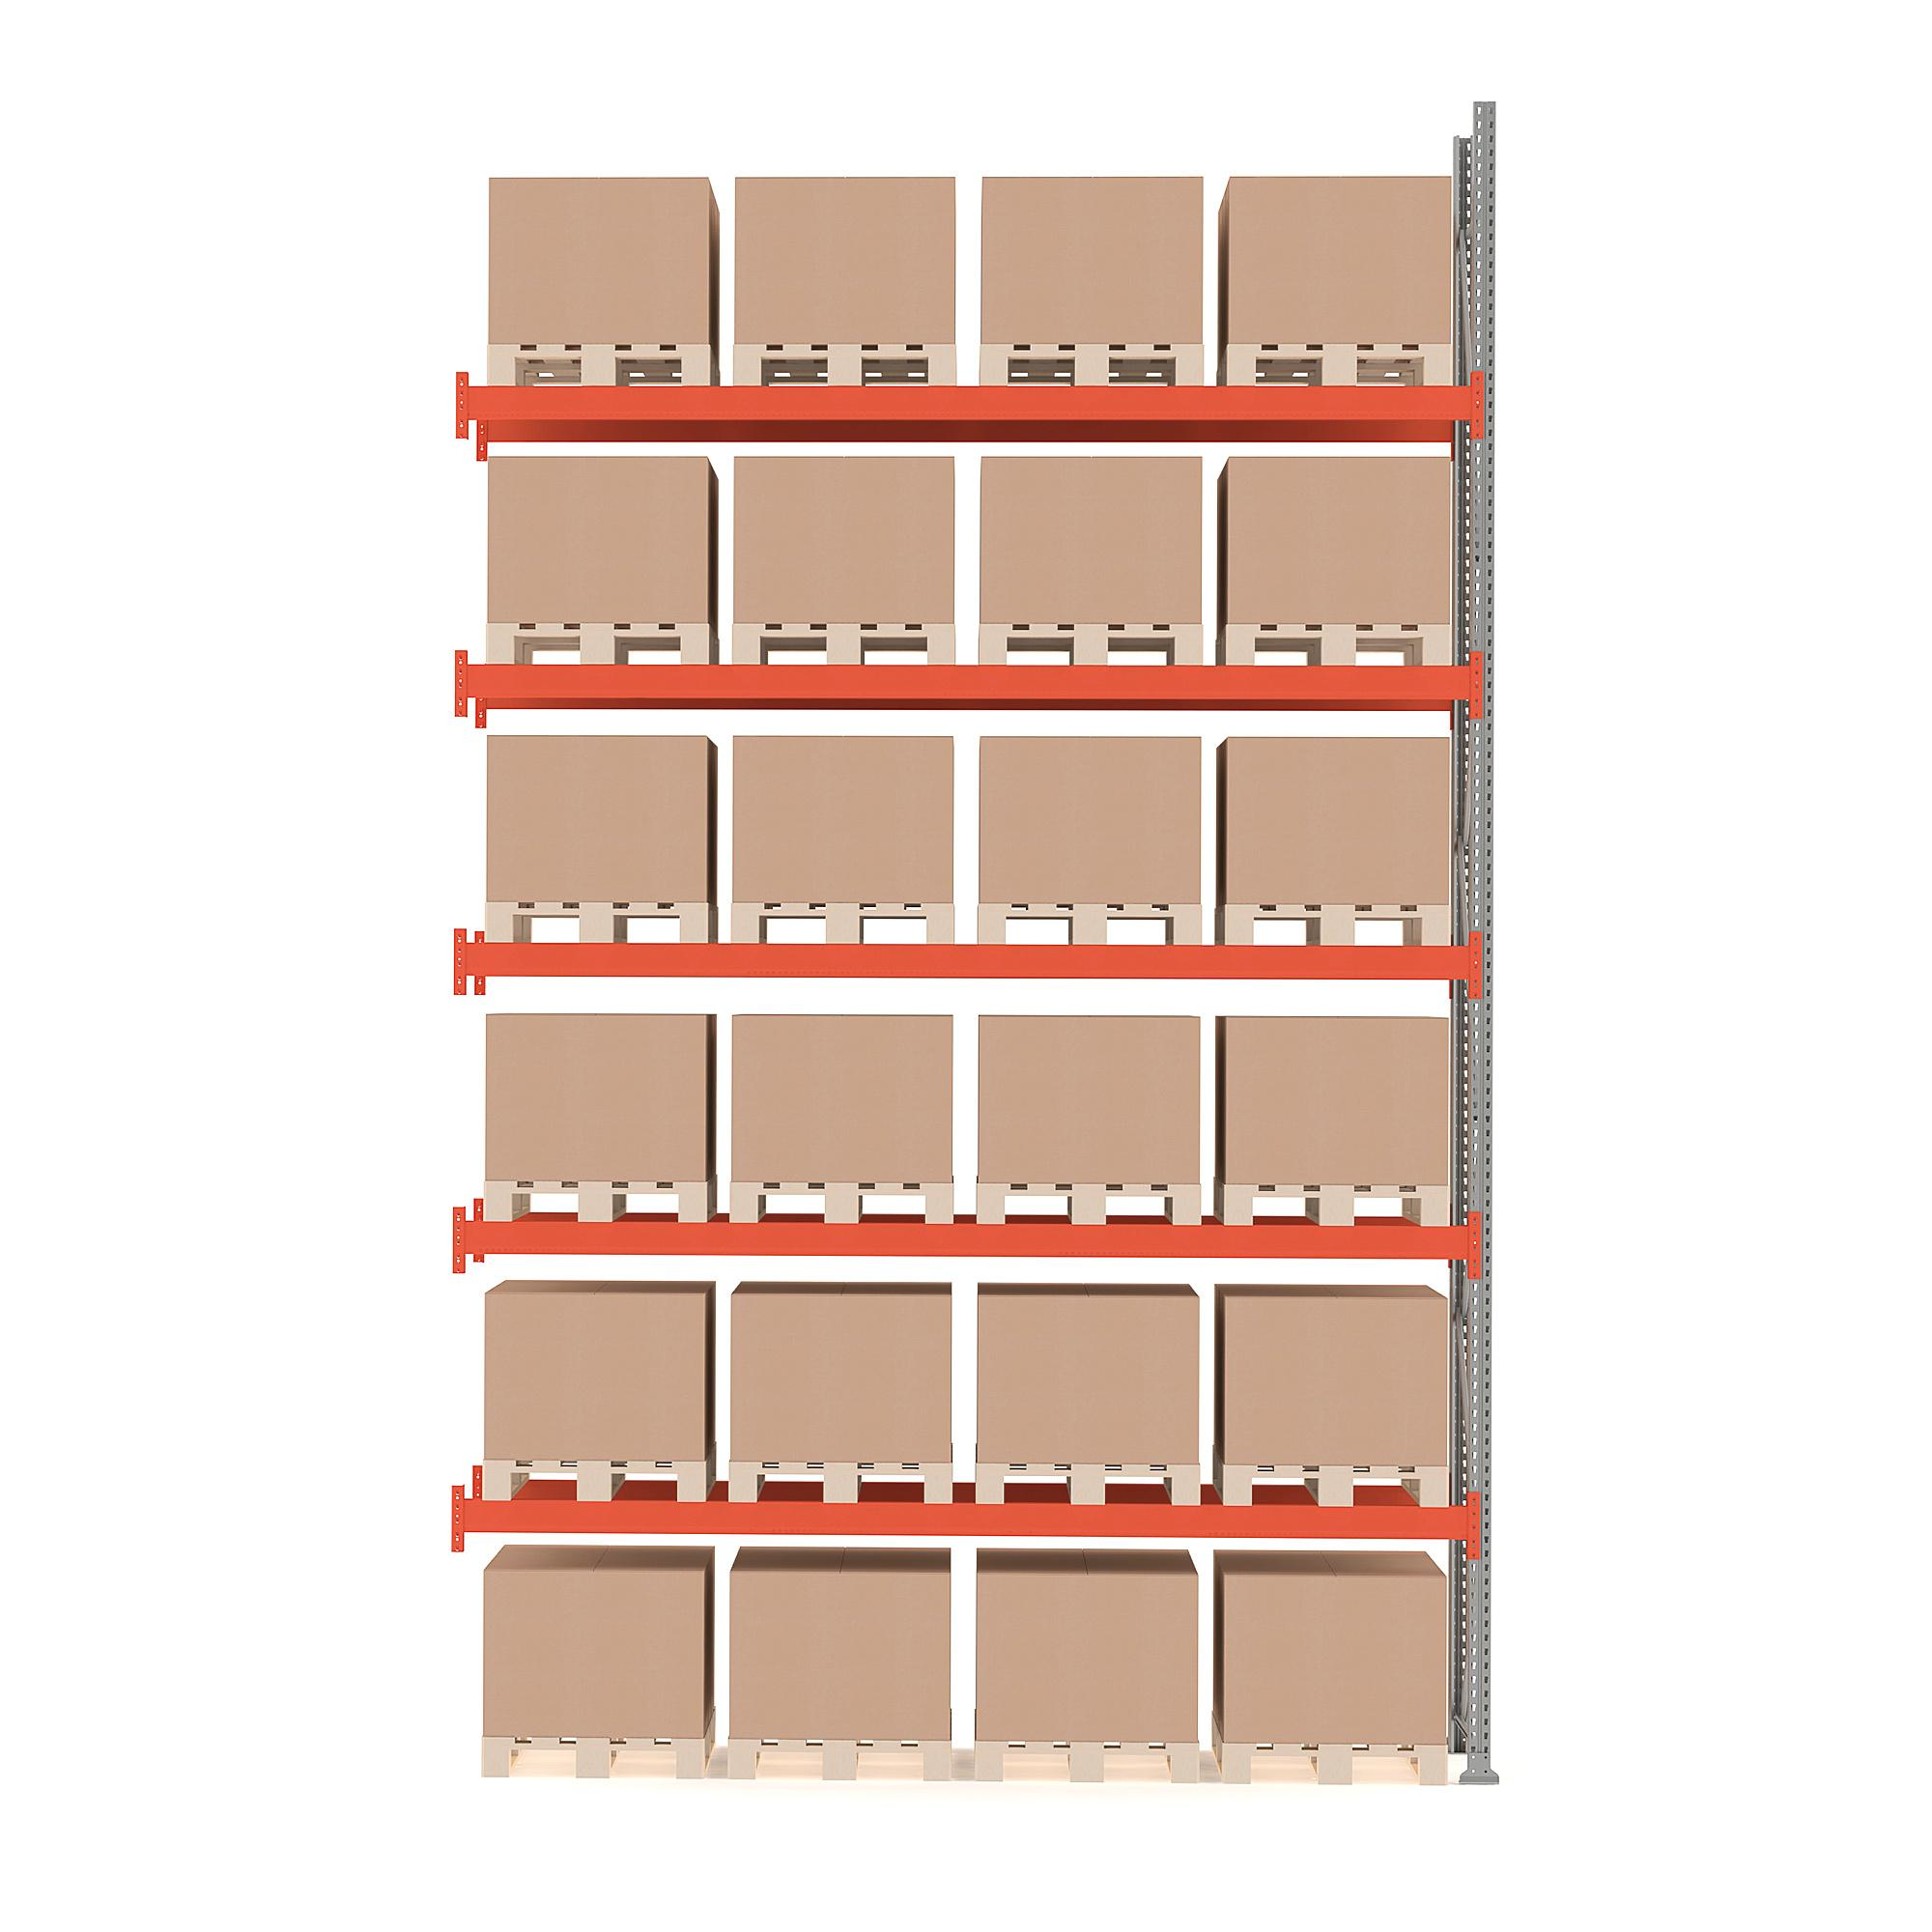 Paletový regál Ultimate, prídavná sekcia, 24 paliet, 6000x3600x1100 mm